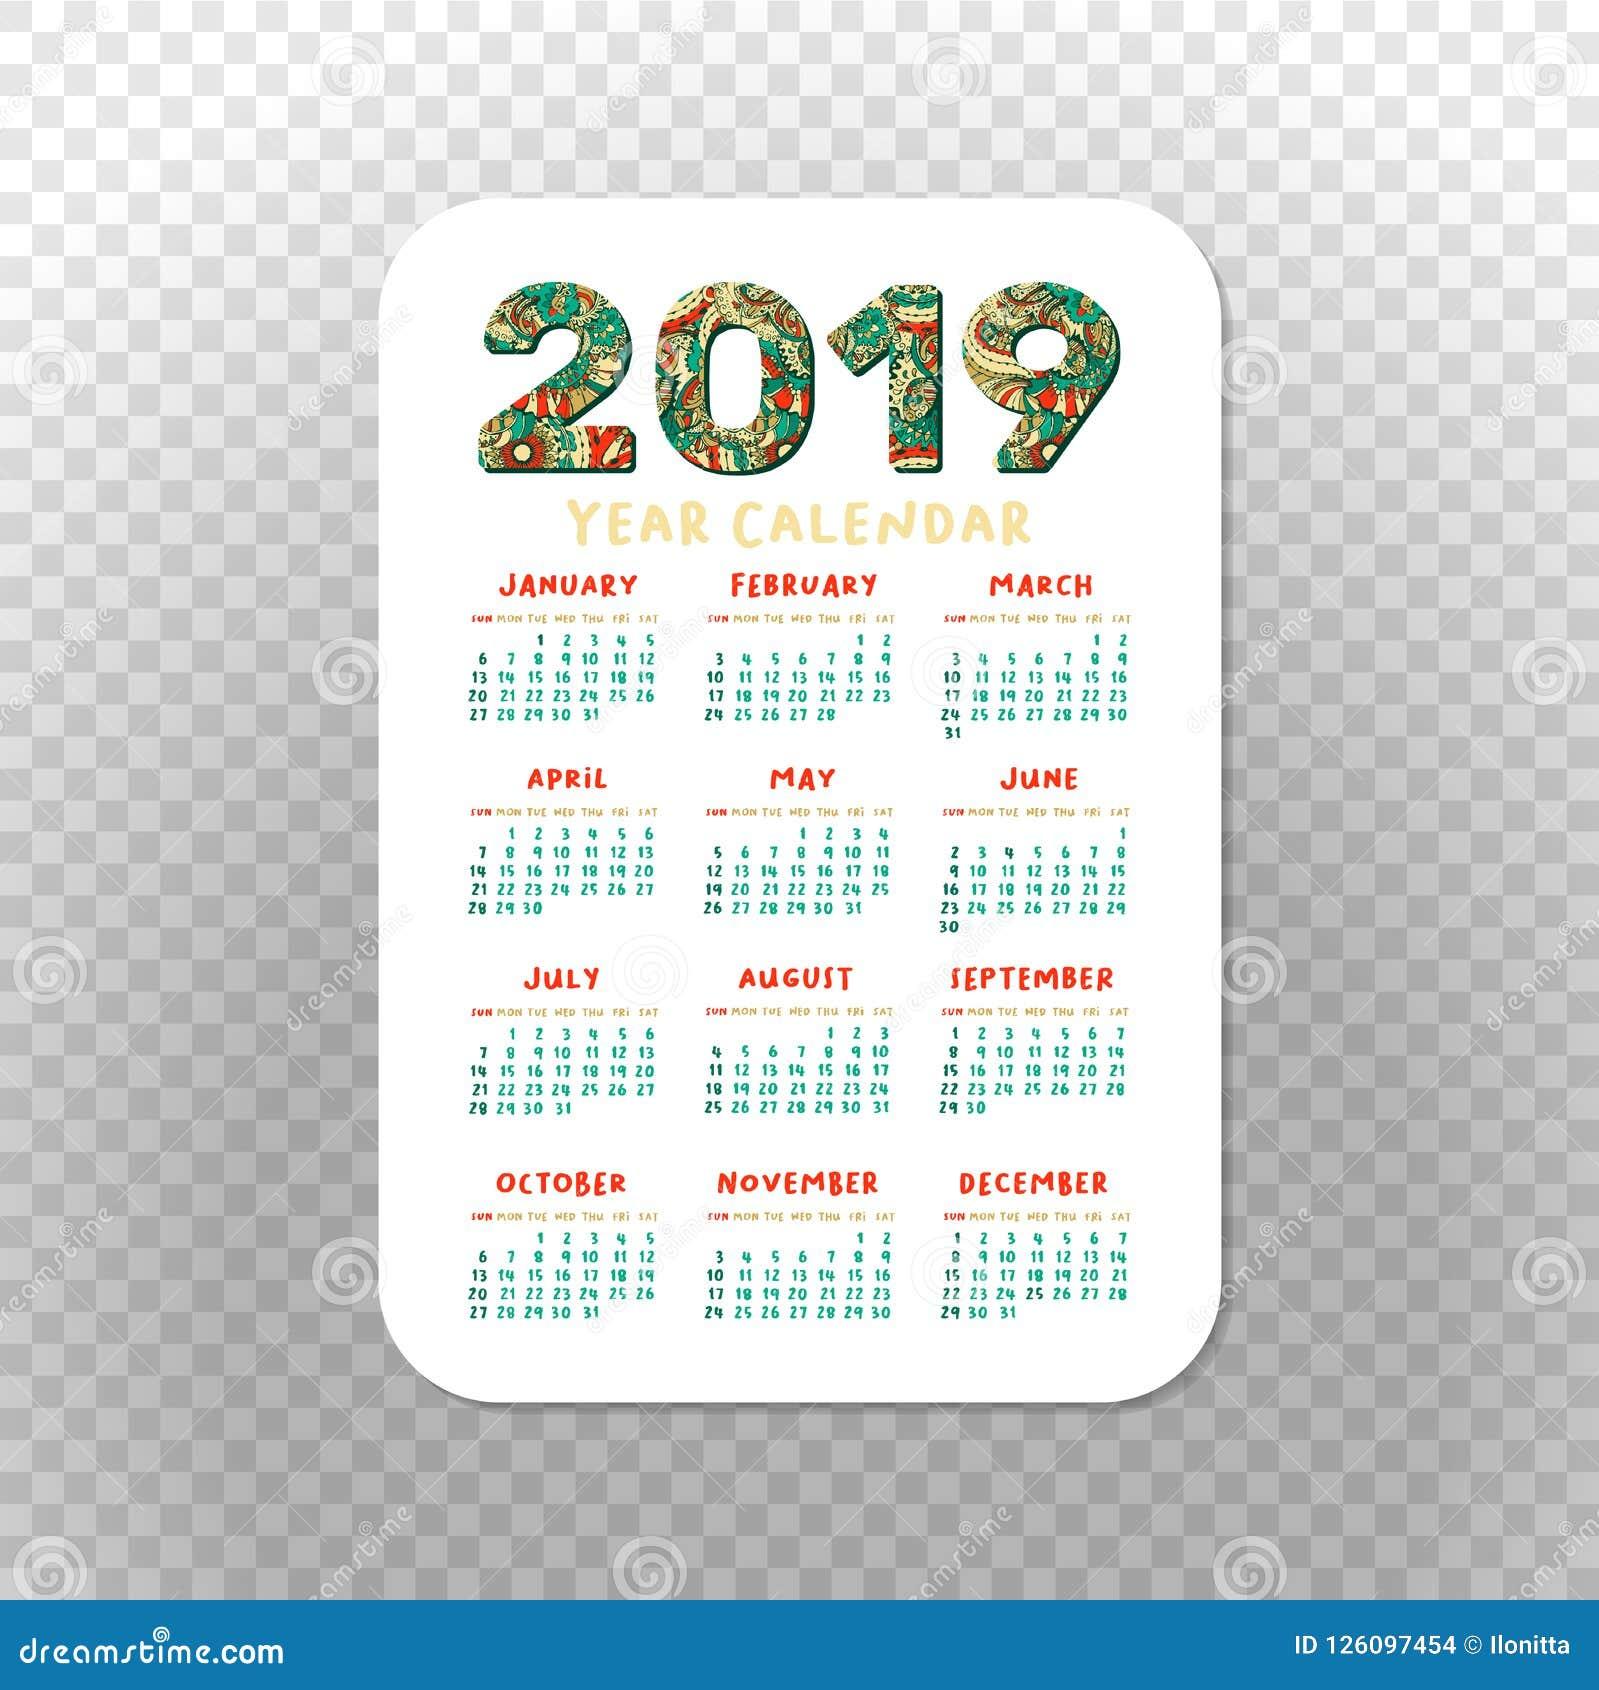 Christmas Calendar 2019 Printable 2019 Calendar Template For Pocket Calendar, Basic Grid. Stock